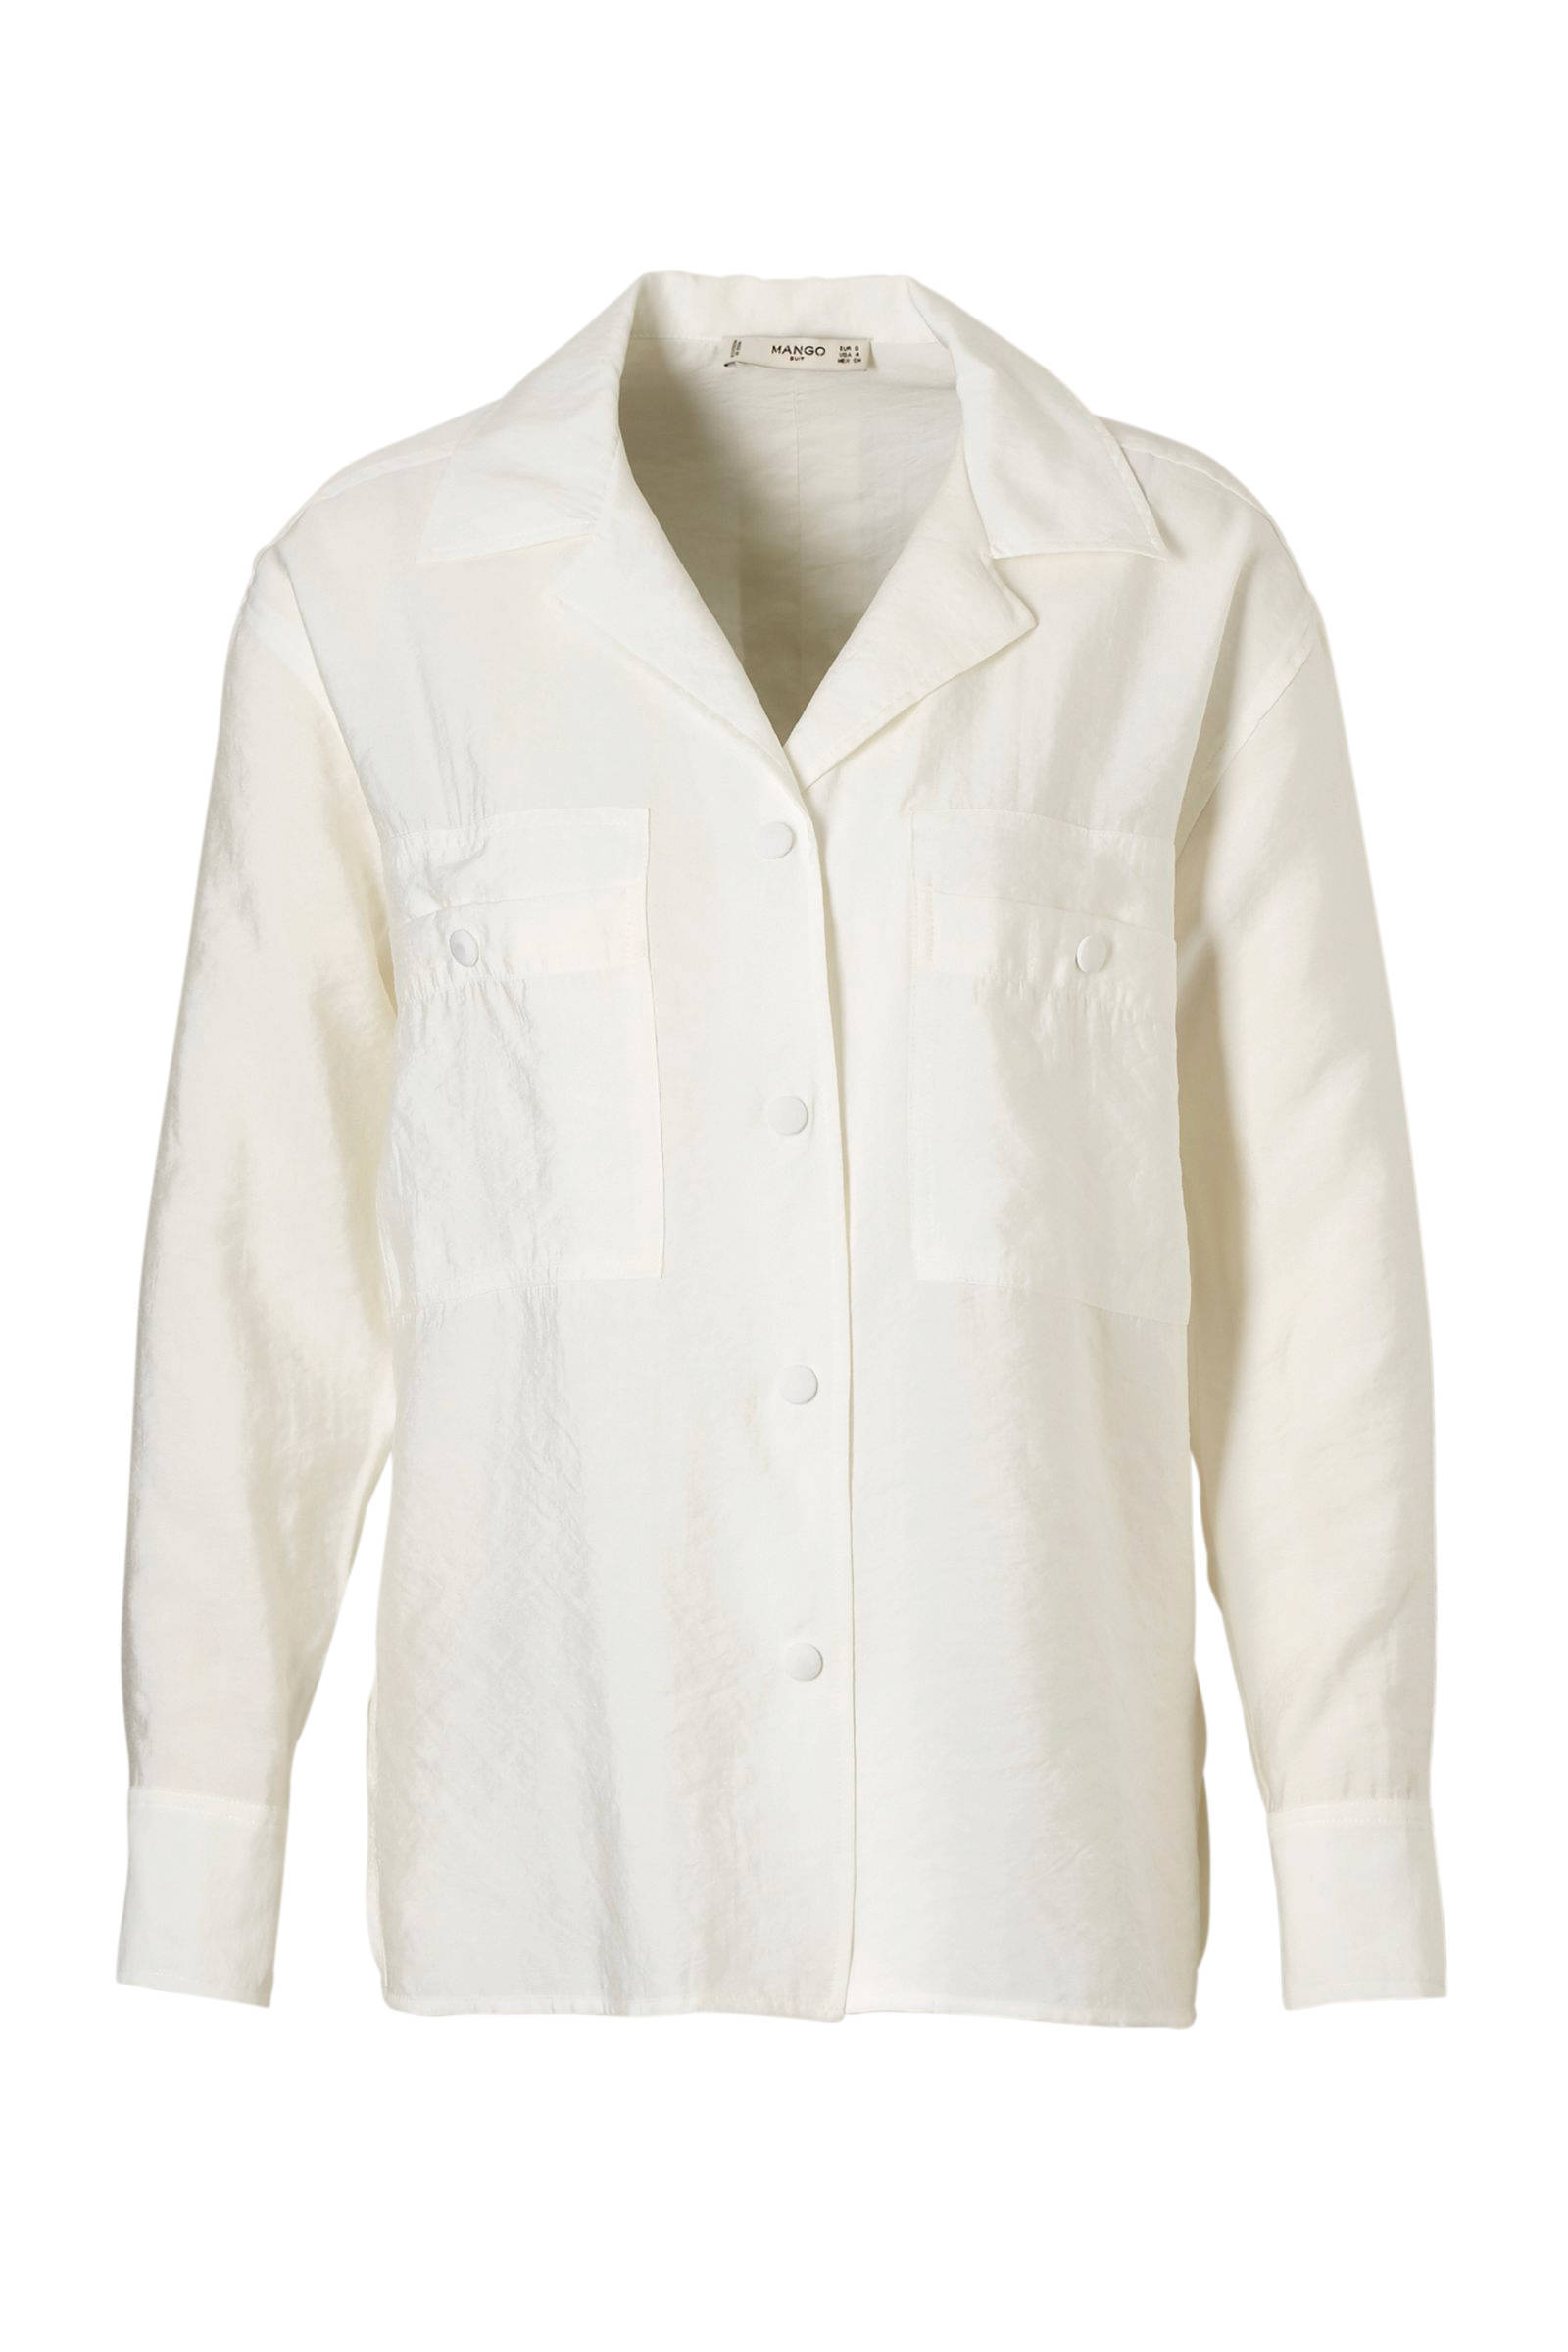 ecru knopen beklede blouse met Mango I1SUqwt